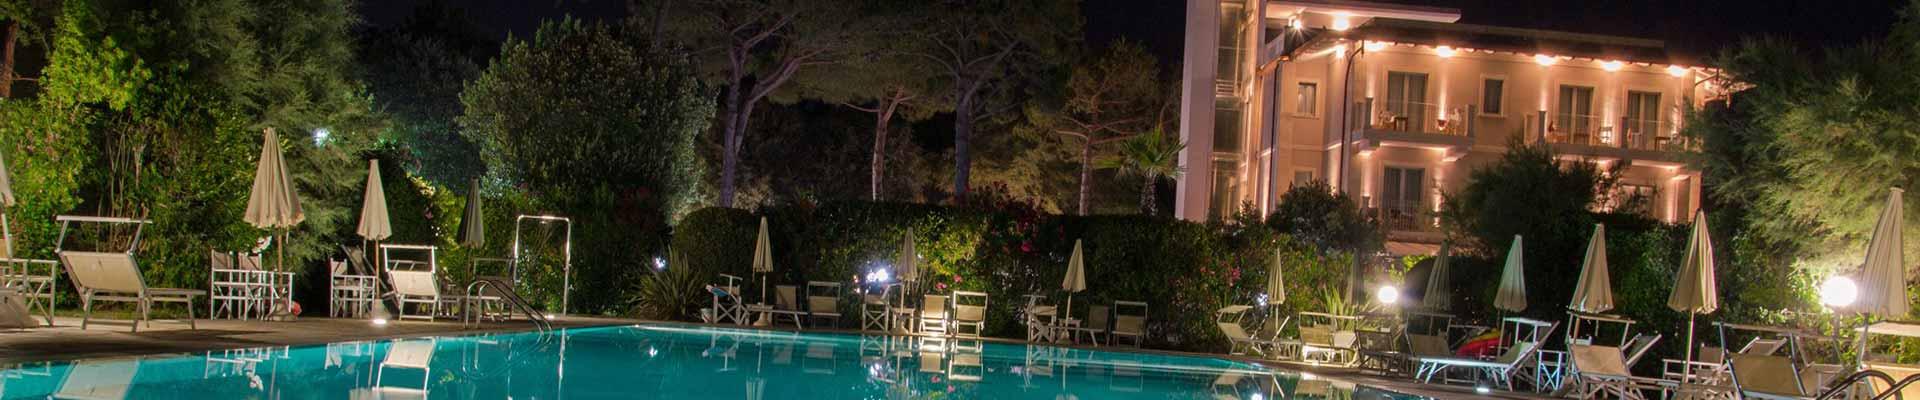 Hotel Villa Elsa si trova a Ronchi di Marina di Massa, Toscana